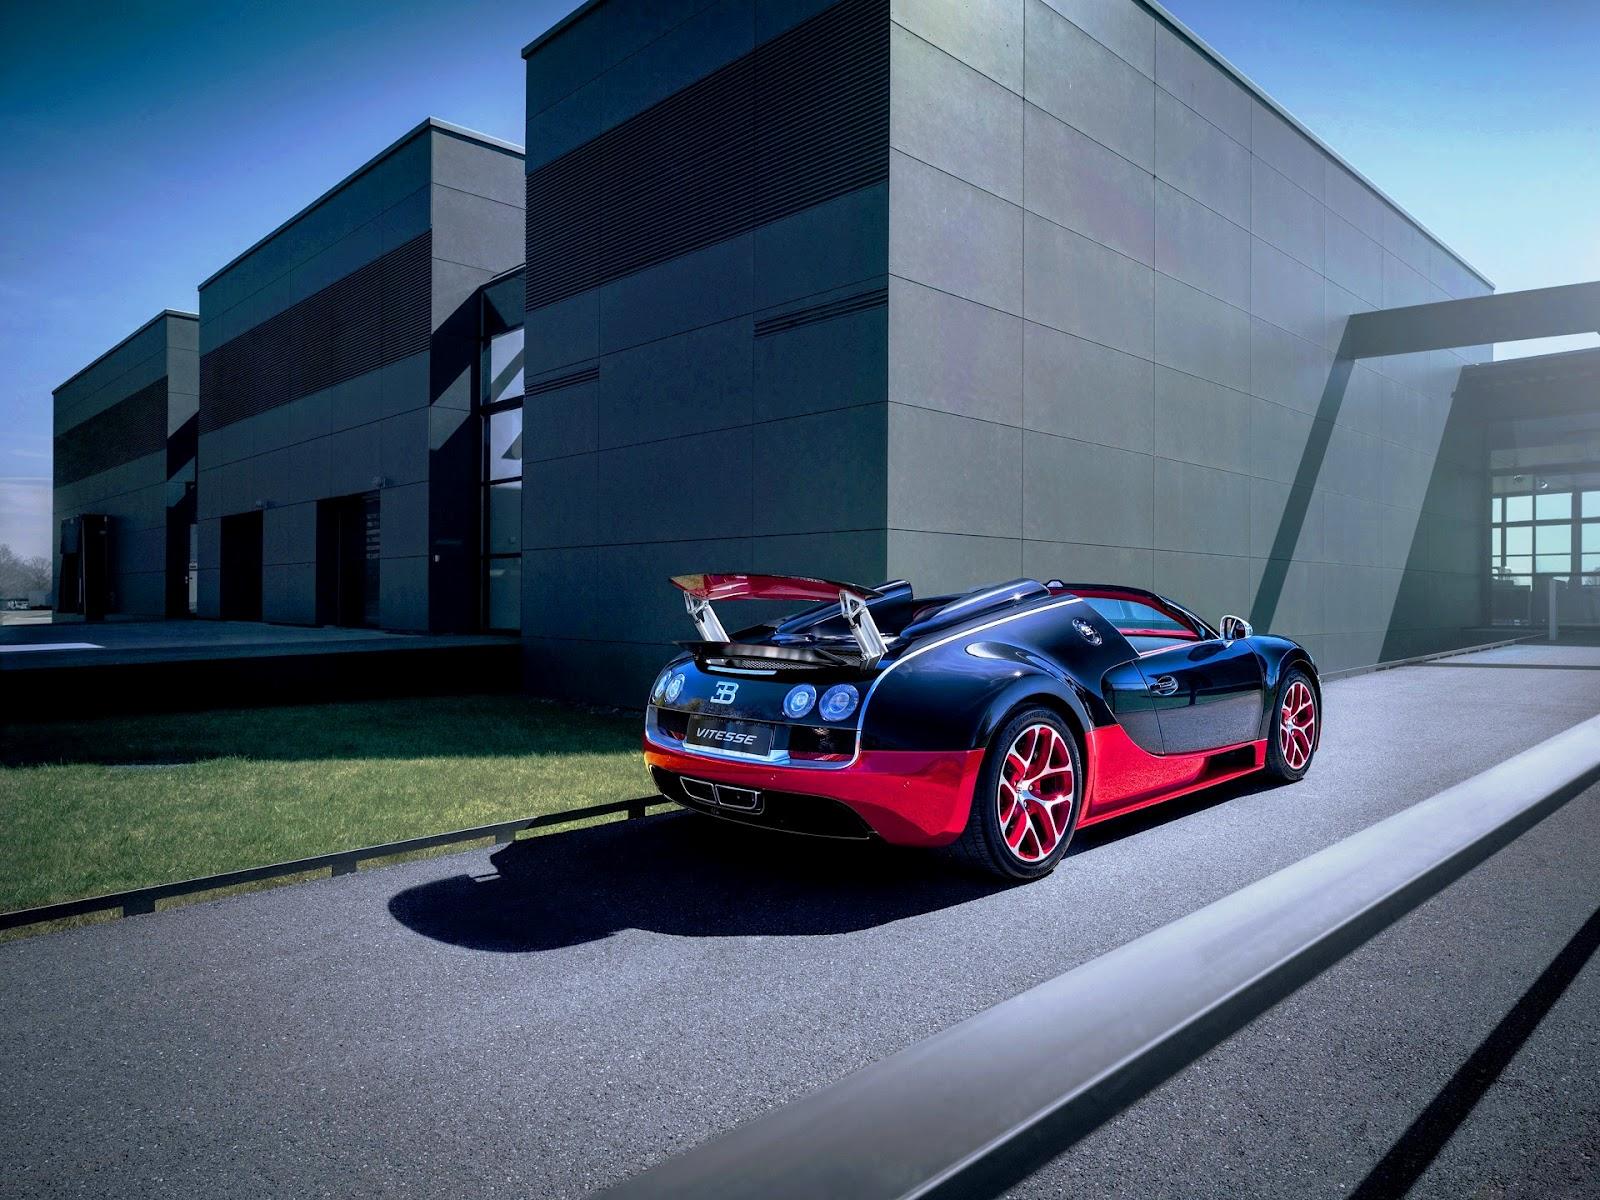 2012 bugatti veyron grand sport vitesse black and red news hot car. Black Bedroom Furniture Sets. Home Design Ideas